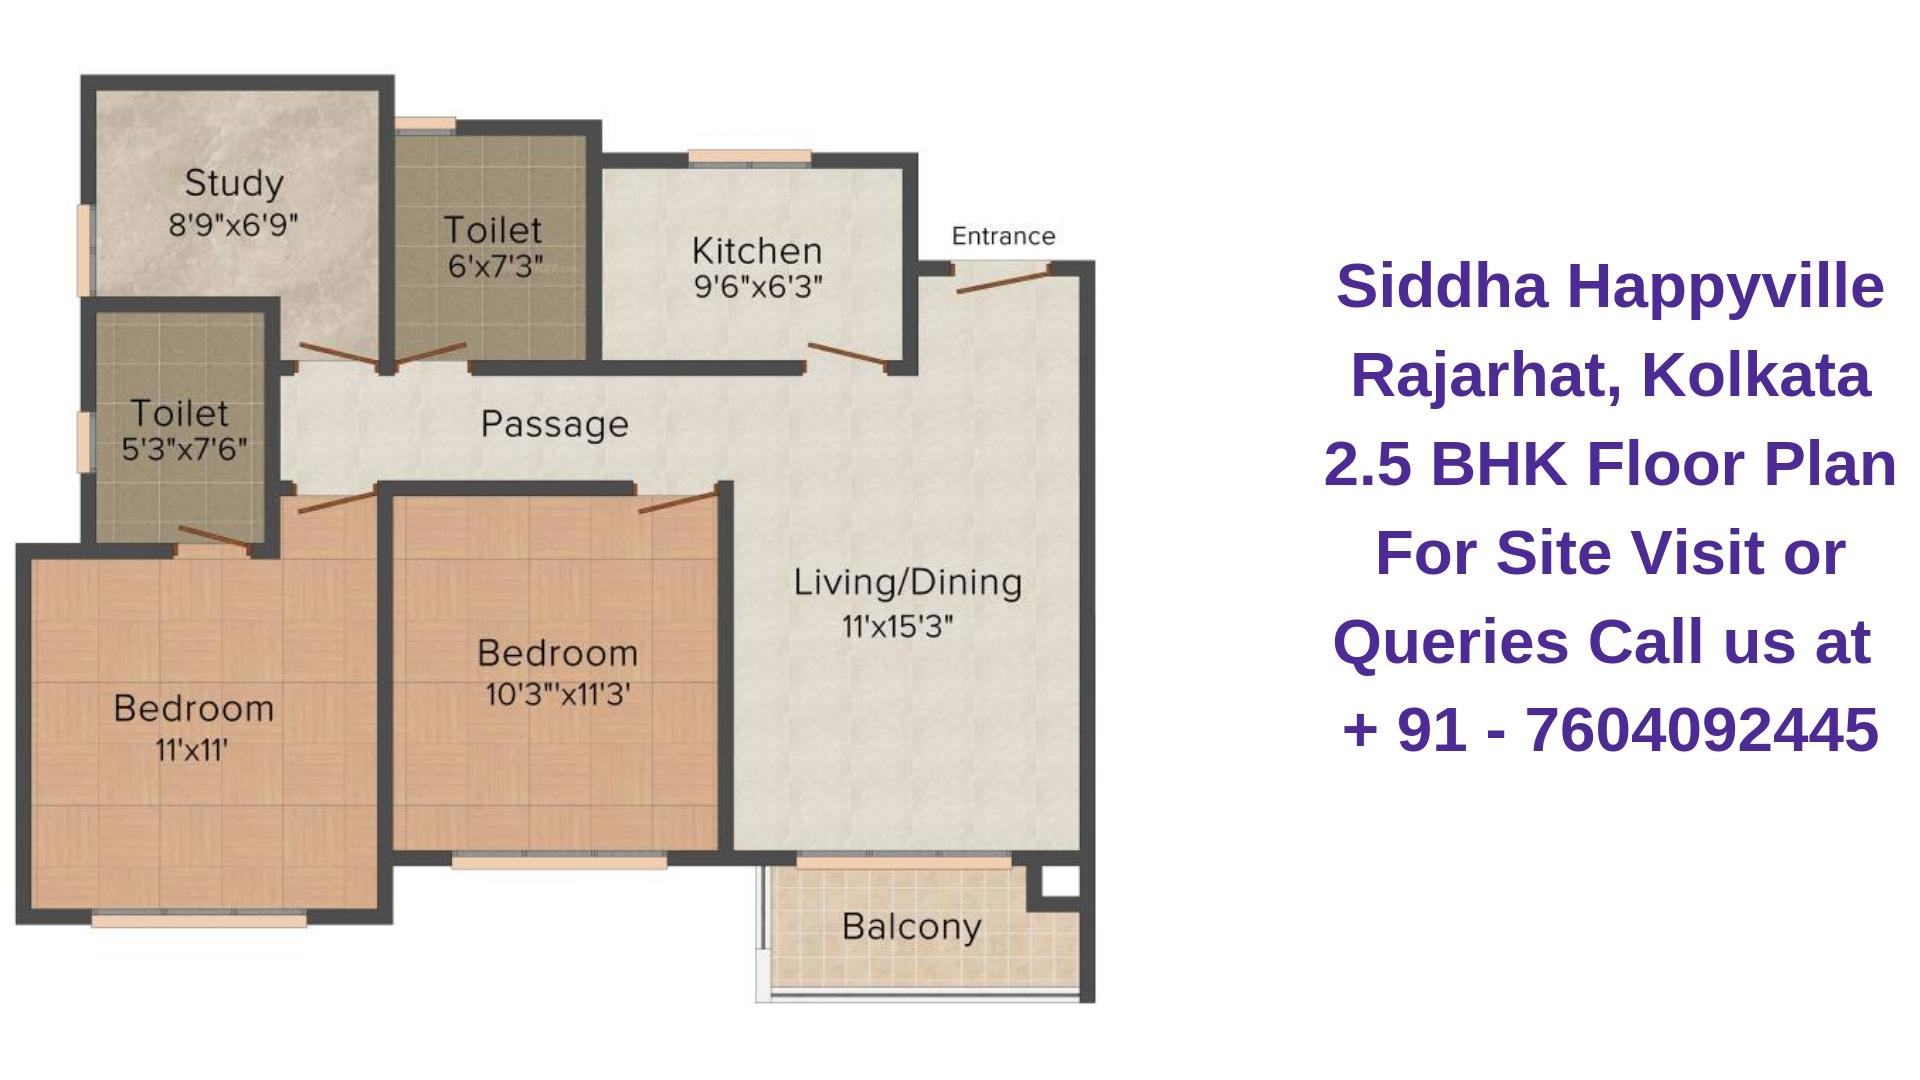 Siddha Happyville Rajarhat, Kolkata 2.5 BHK - 1075 Sqft Floor Plan